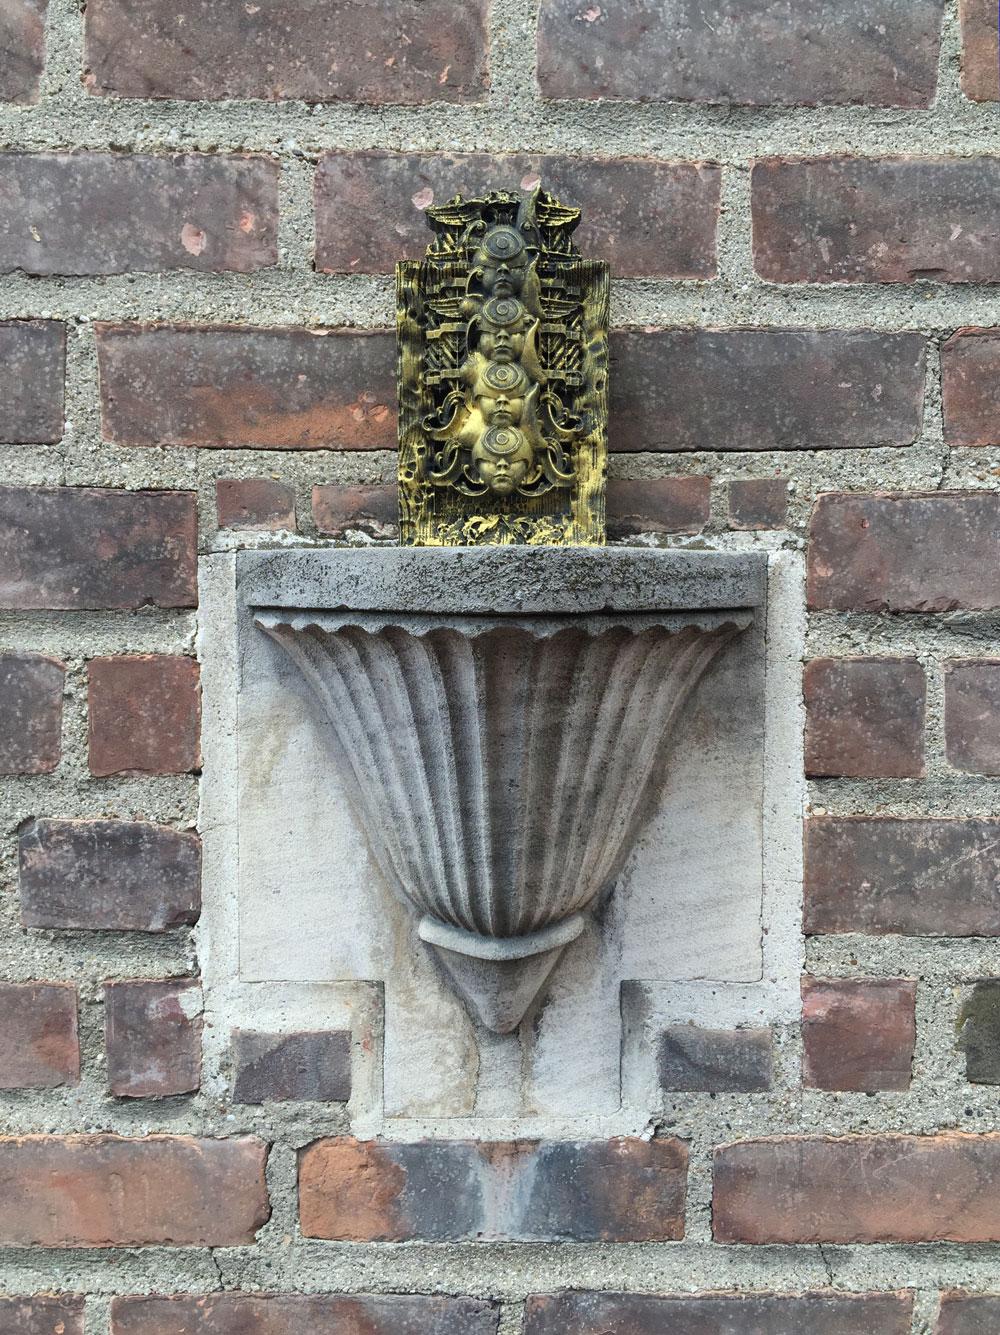 Untitled by Elliott Earls on Pedestal